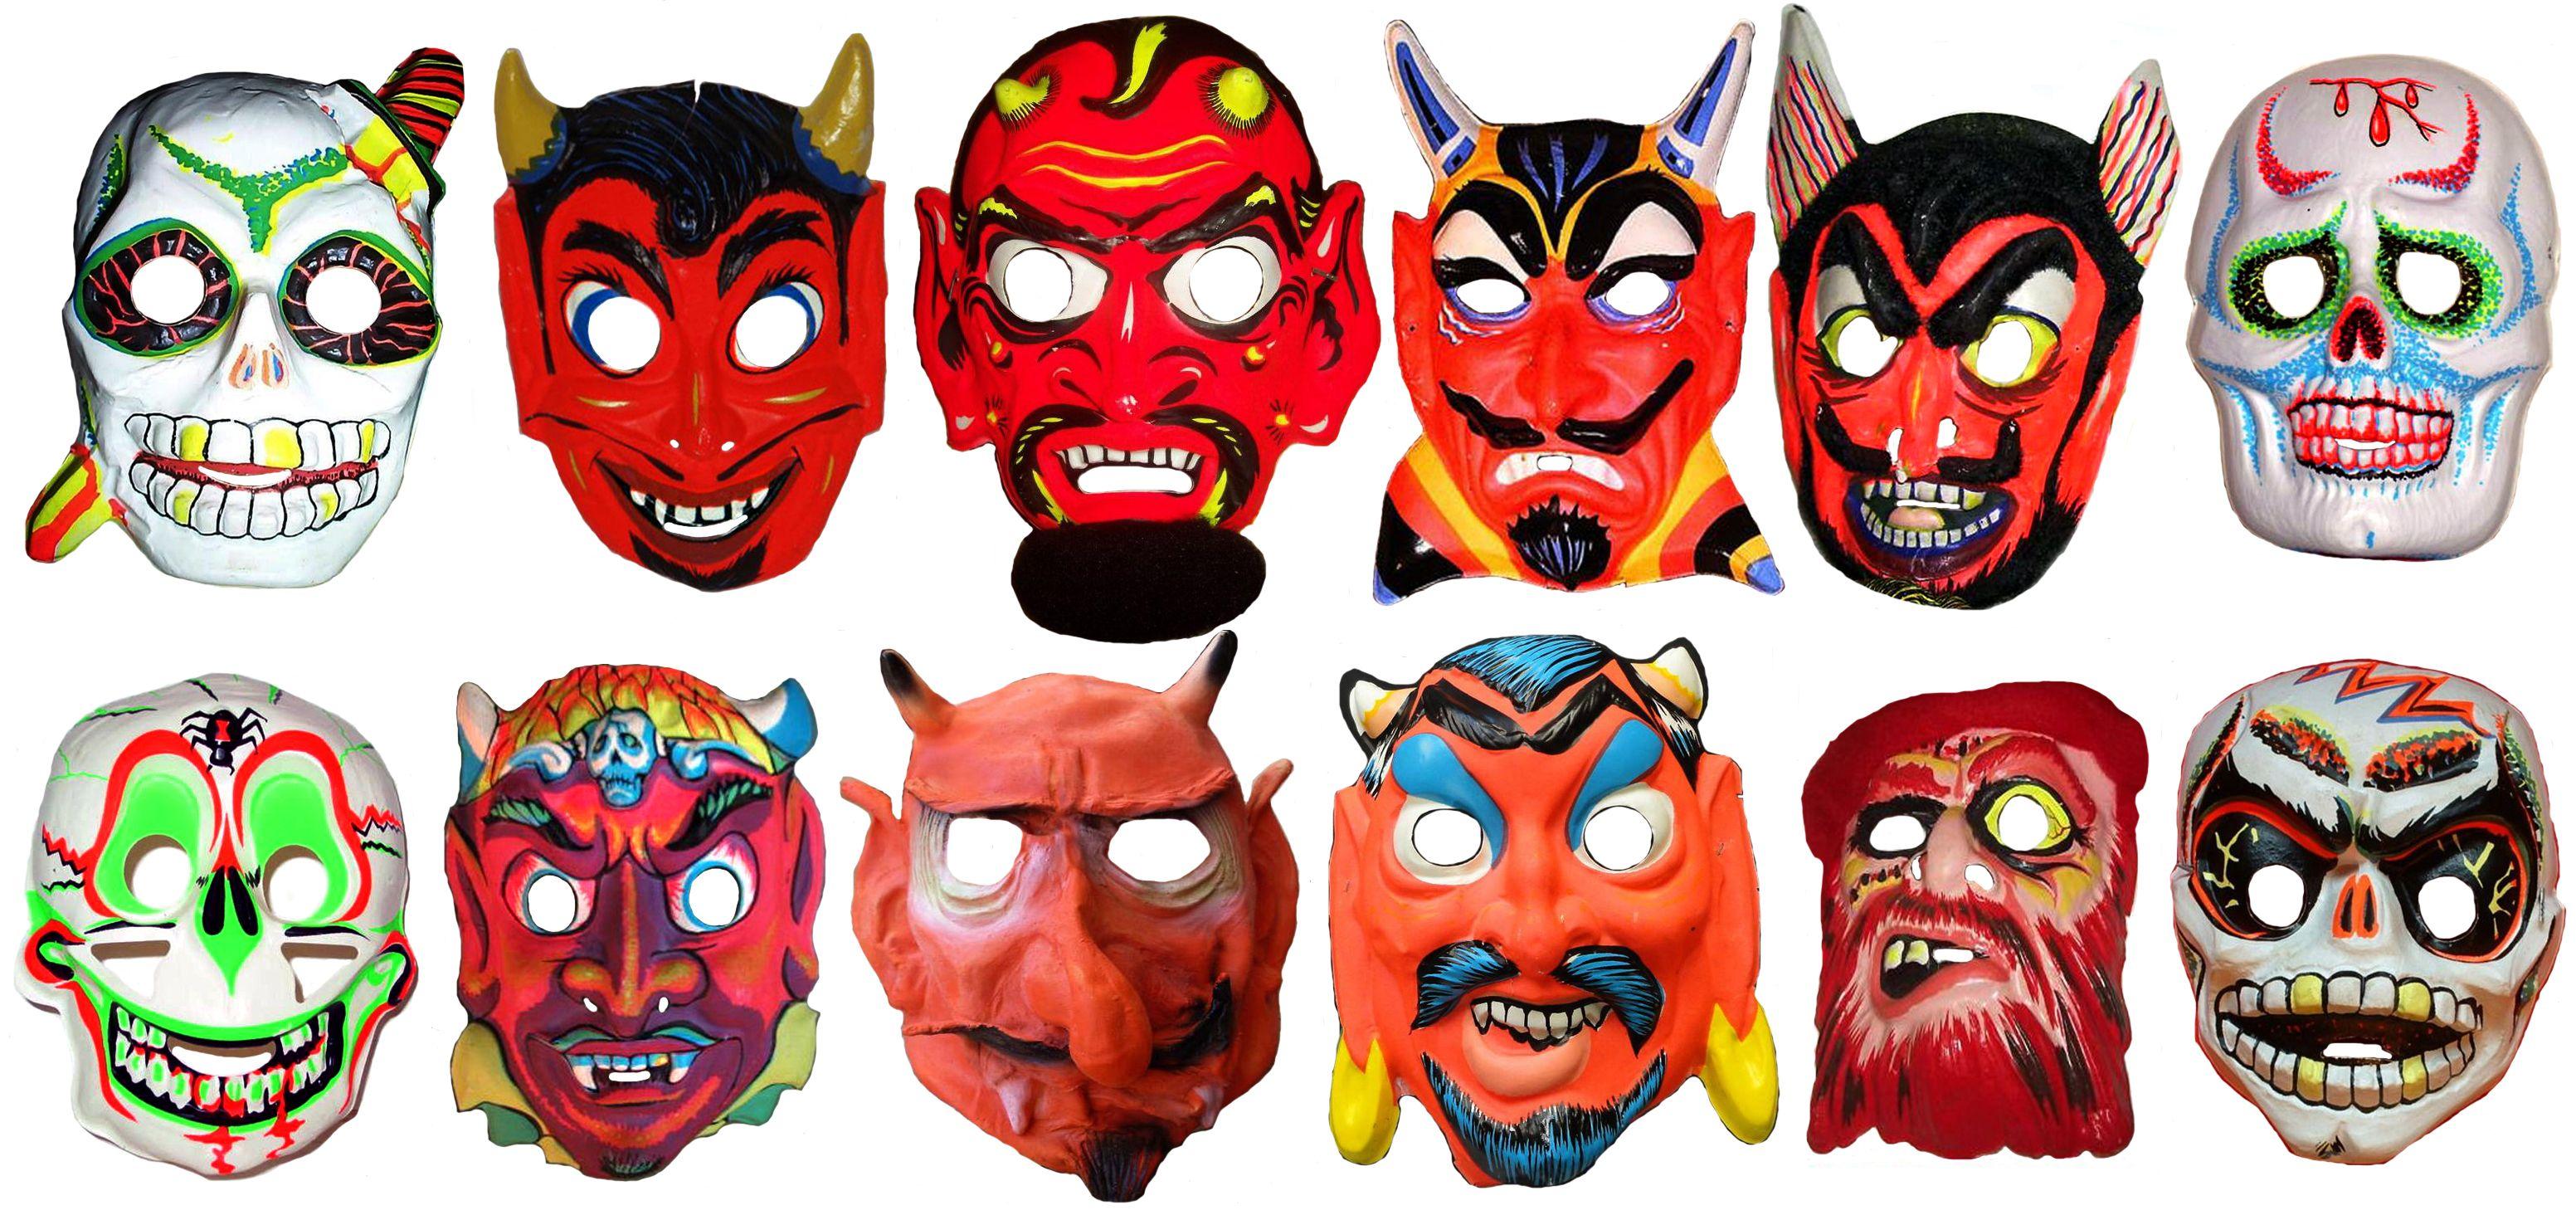 Vintage Halloween Masks | Products I Love | Pinterest | Halloween ...